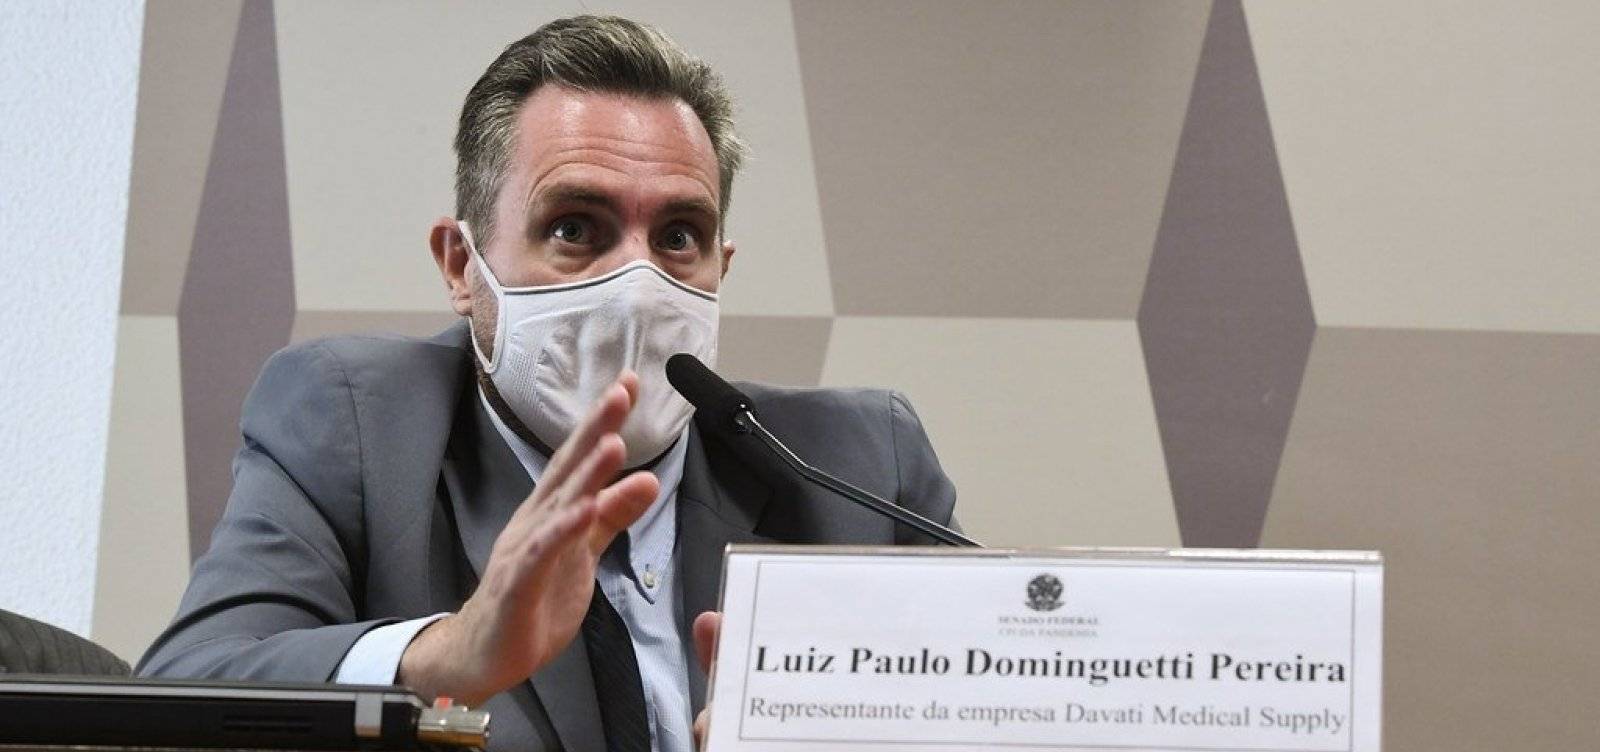 Na CPI, Dominguetti confirma proposta de propina de 1 dólar por dose de vacina